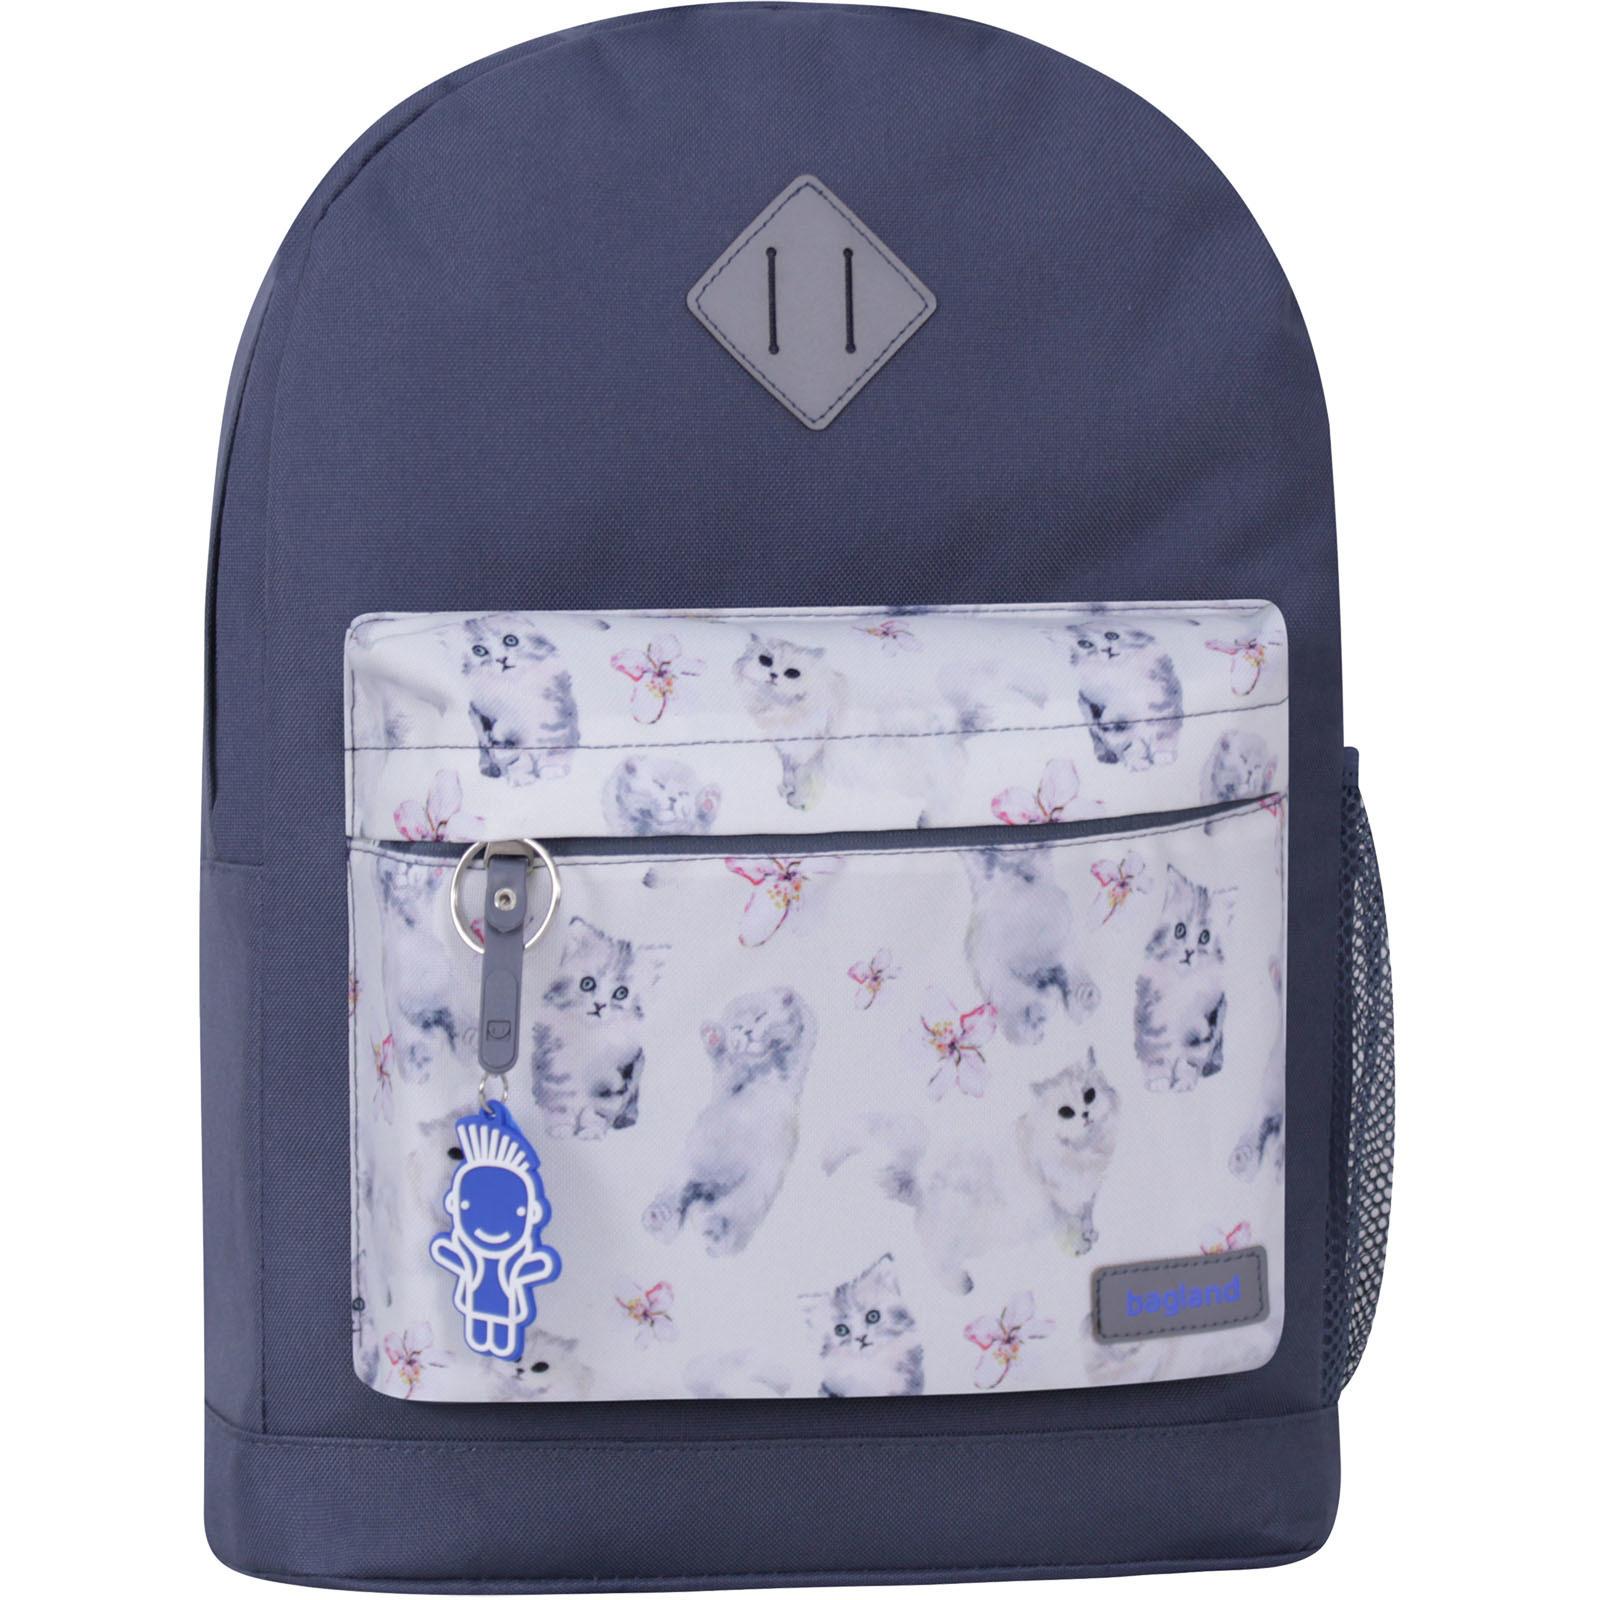 Женские рюкзаки Рюкзак Bagland Молодежный W/R 17 л. Серый 986 (00533662) IMG_1076_суб986_-1600.jpg